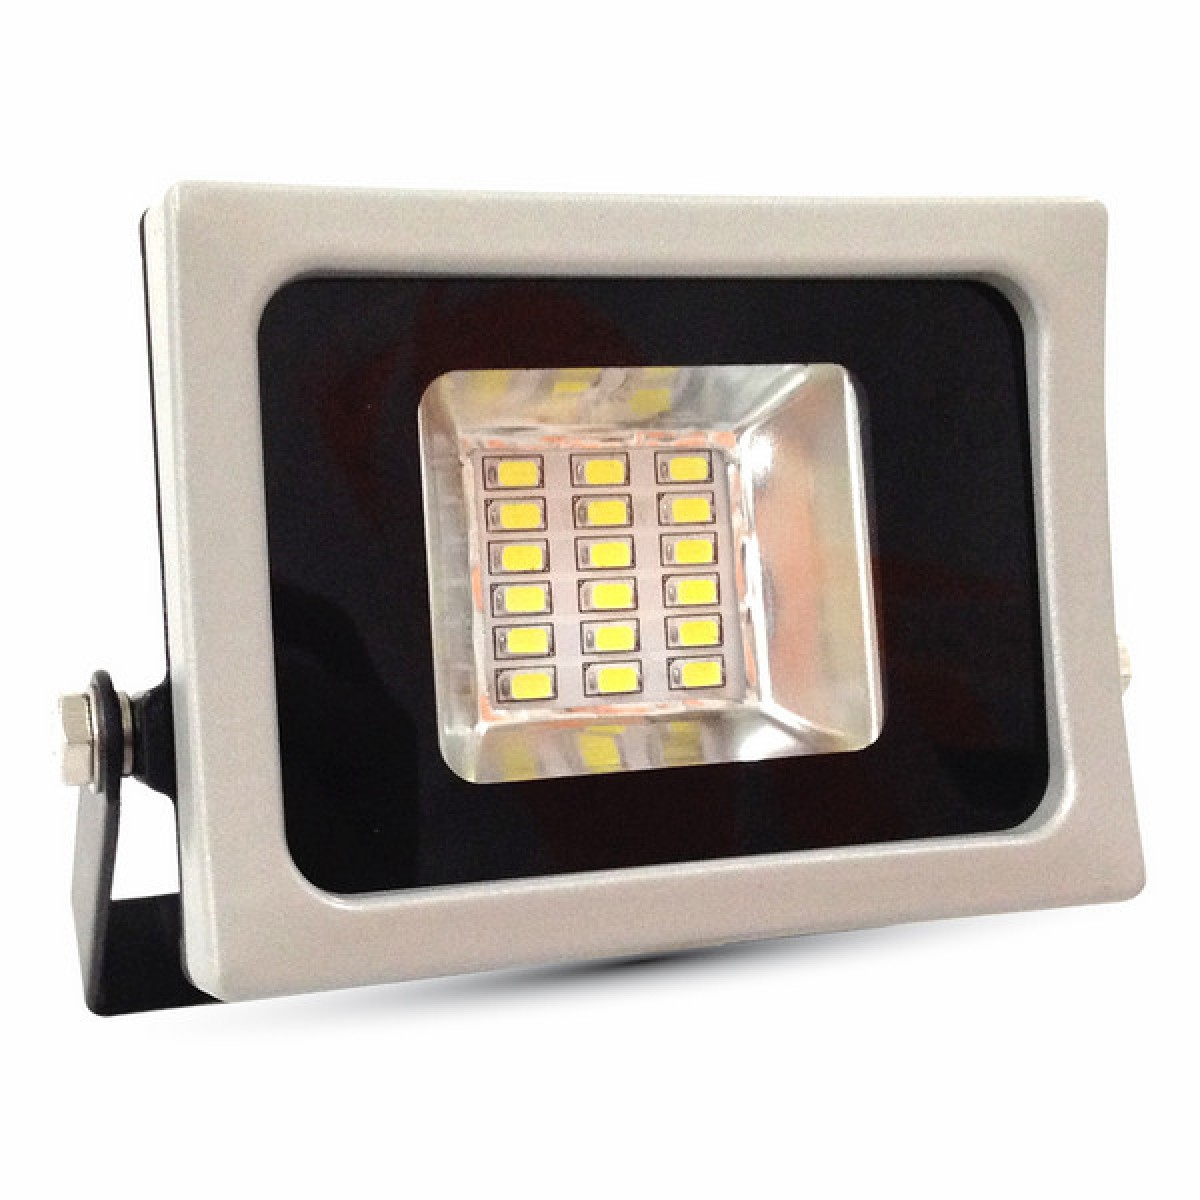 V-TAC - 10W LED Прожектор SMD черно/Сиво 4500K SKU 5721 VT-4810